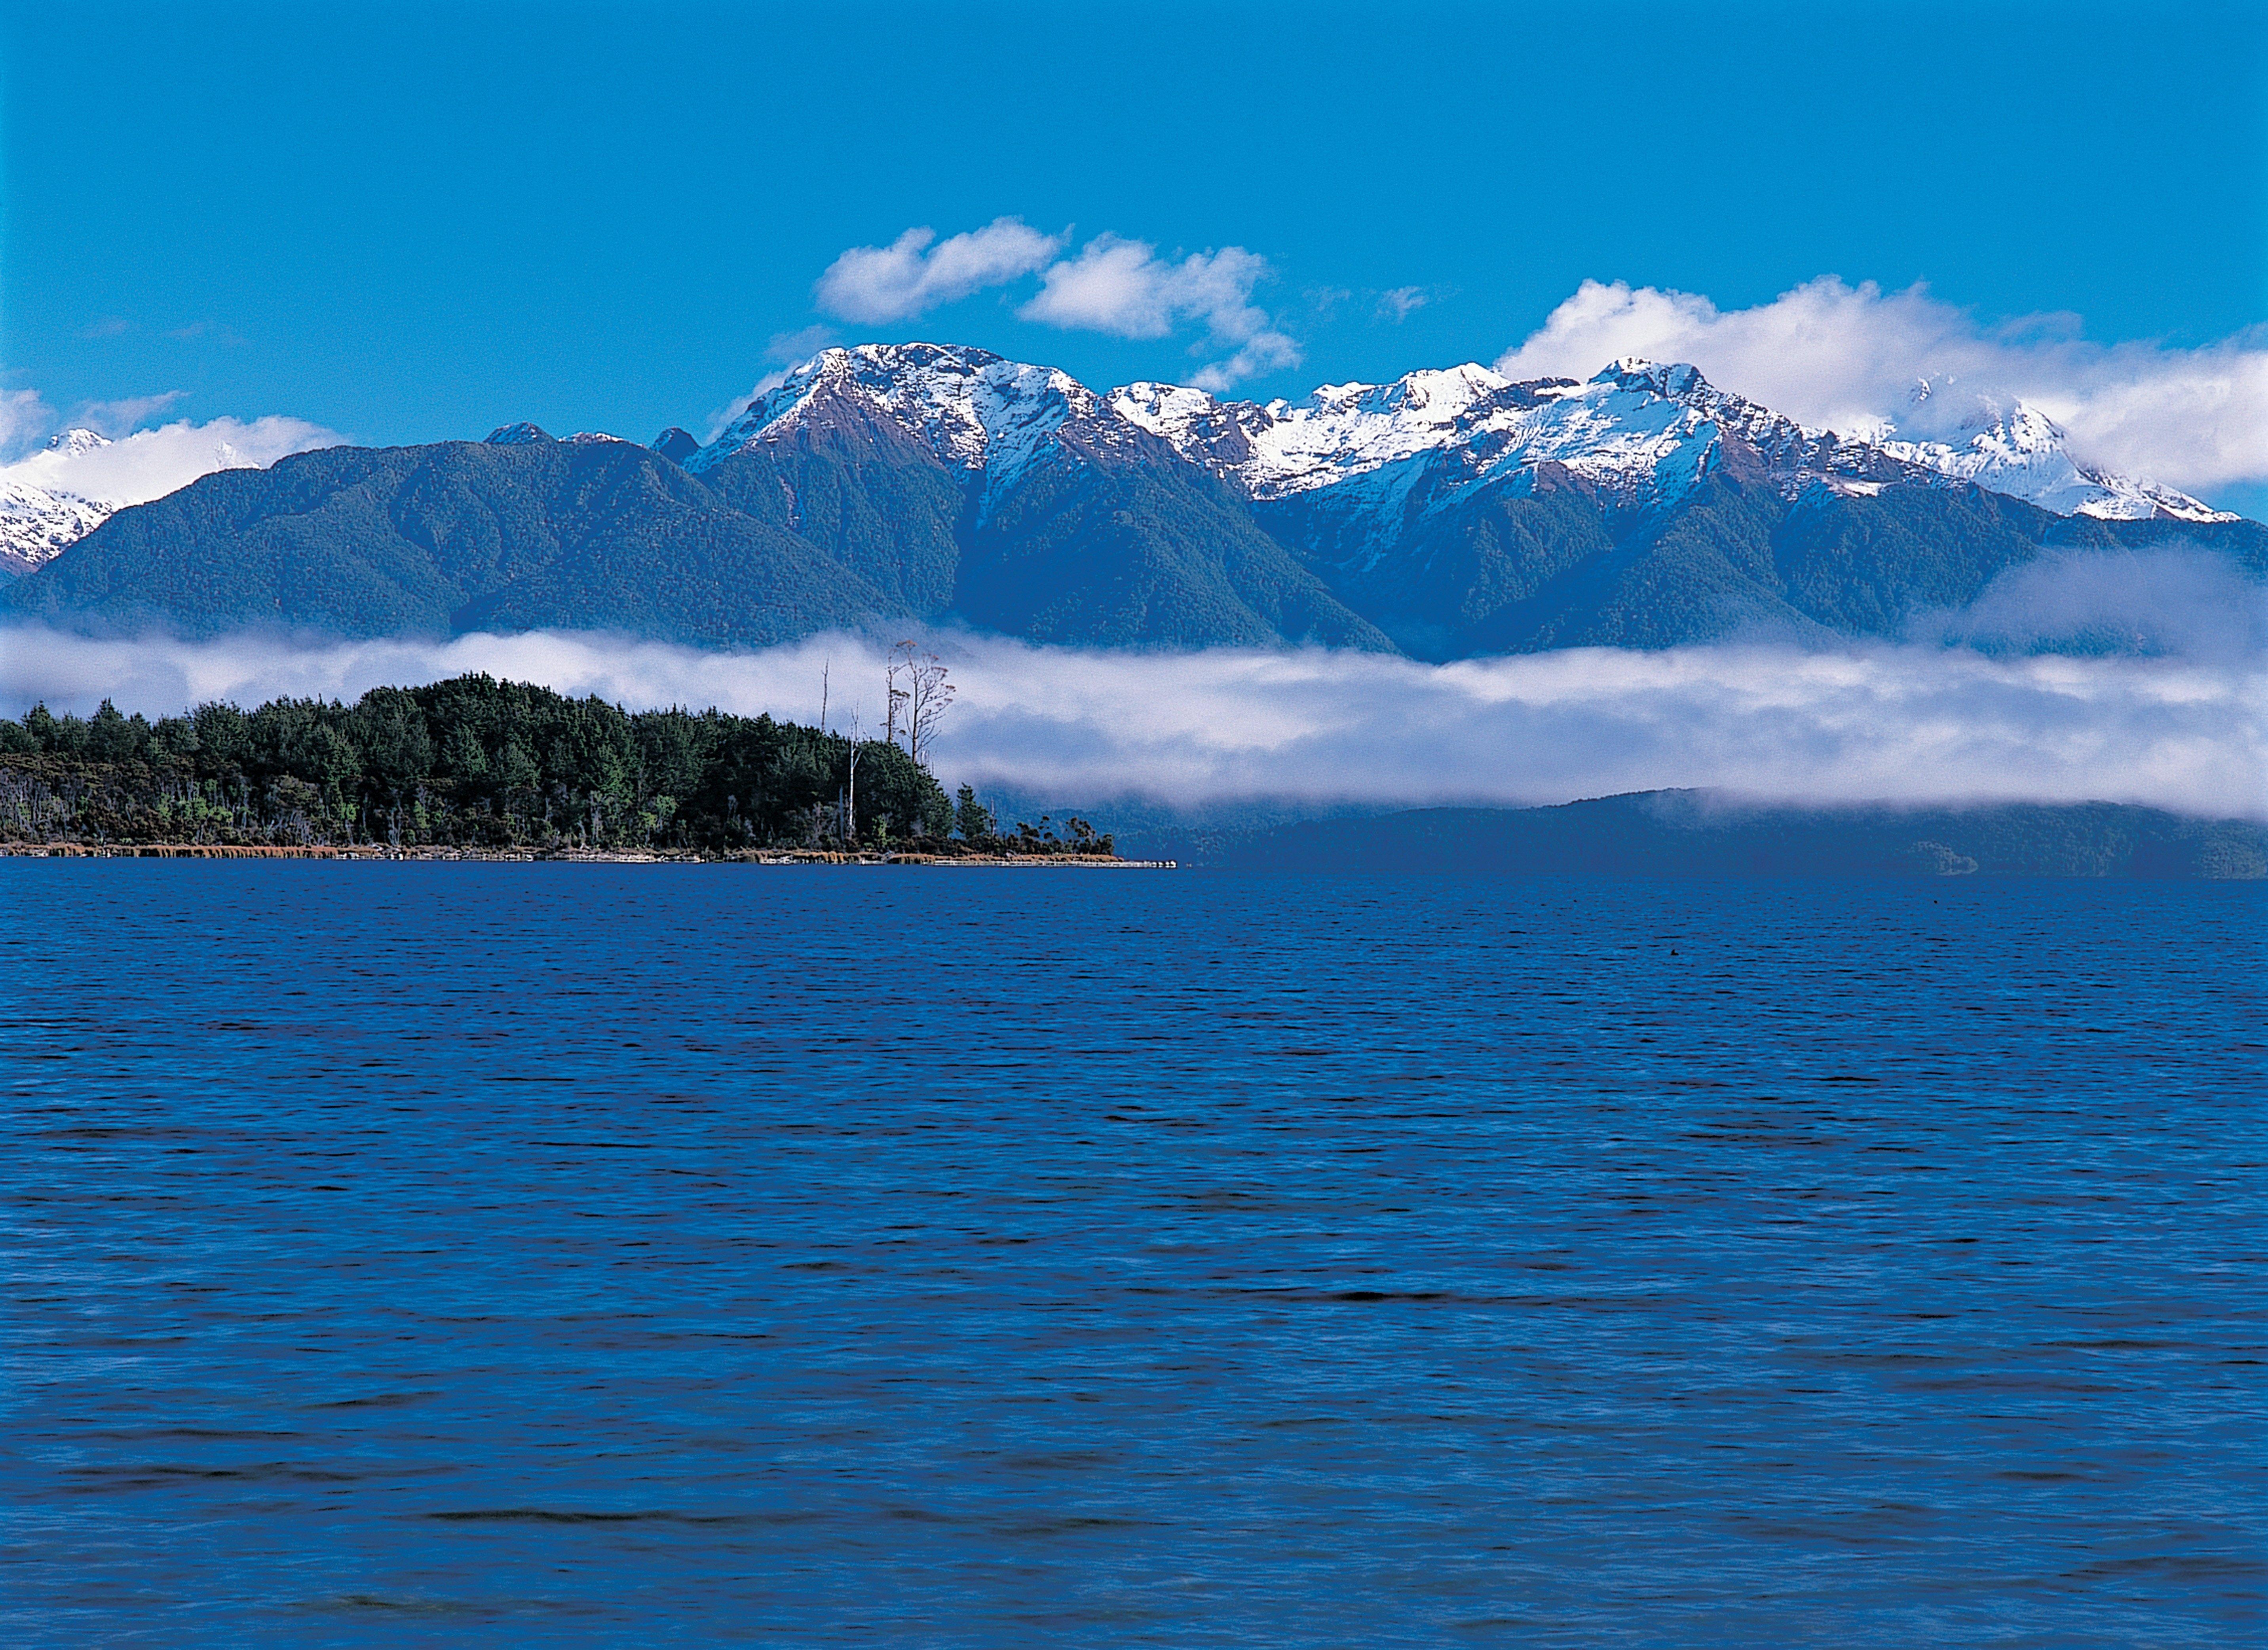 This 235km road trip southern Fiordland takes you from Tuatapere to Lake Te Anau via a valley...